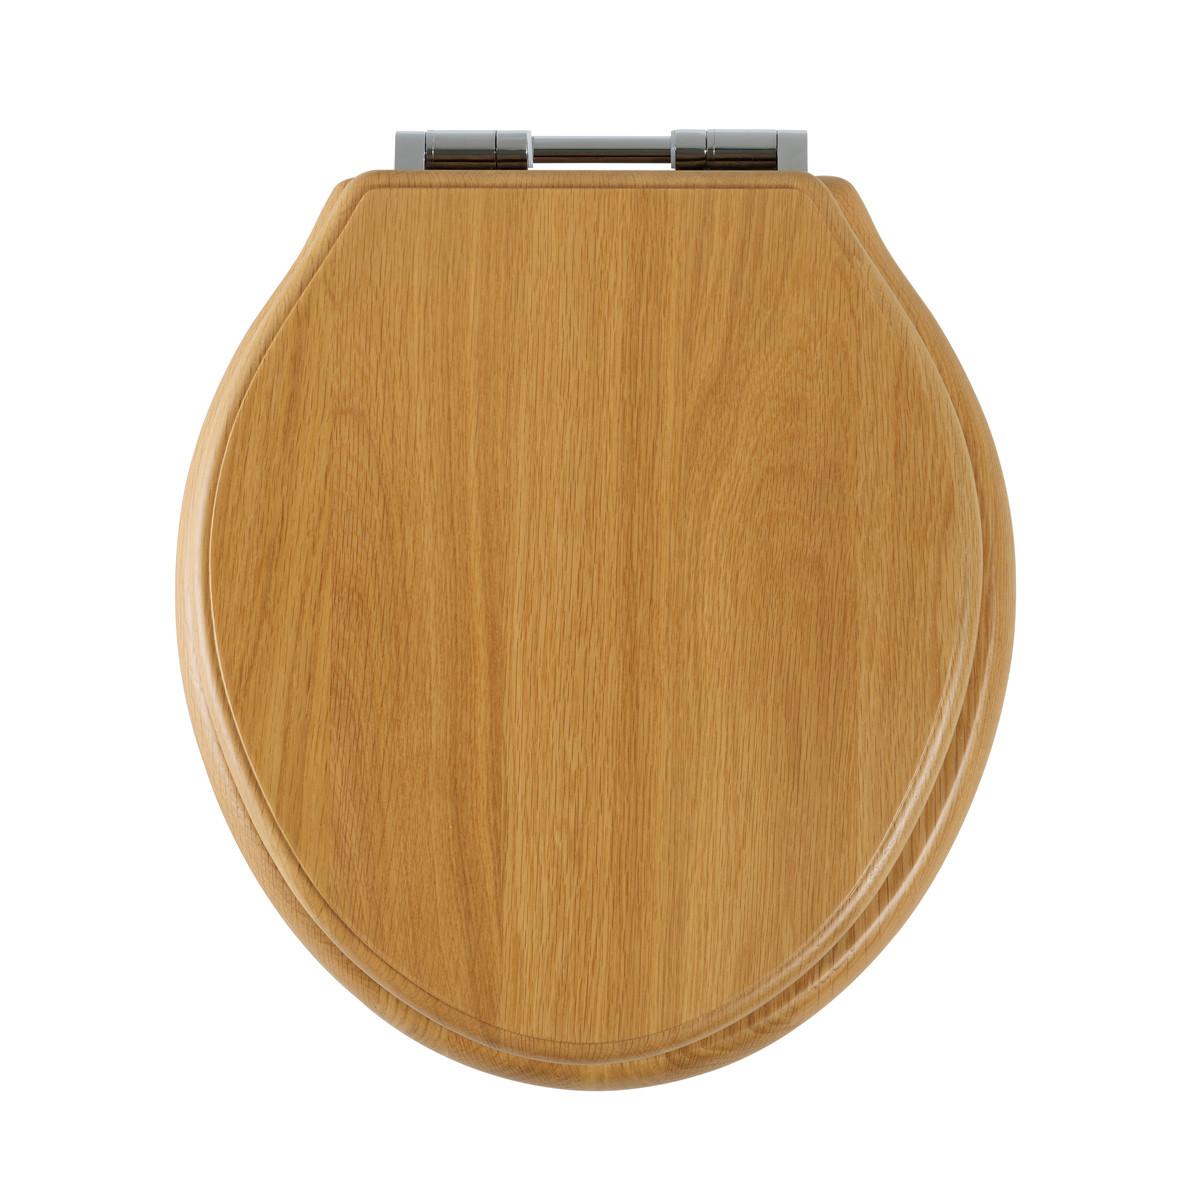 Roper Rhodes Greenwich Solid Wood Oak Soft Close Toilet